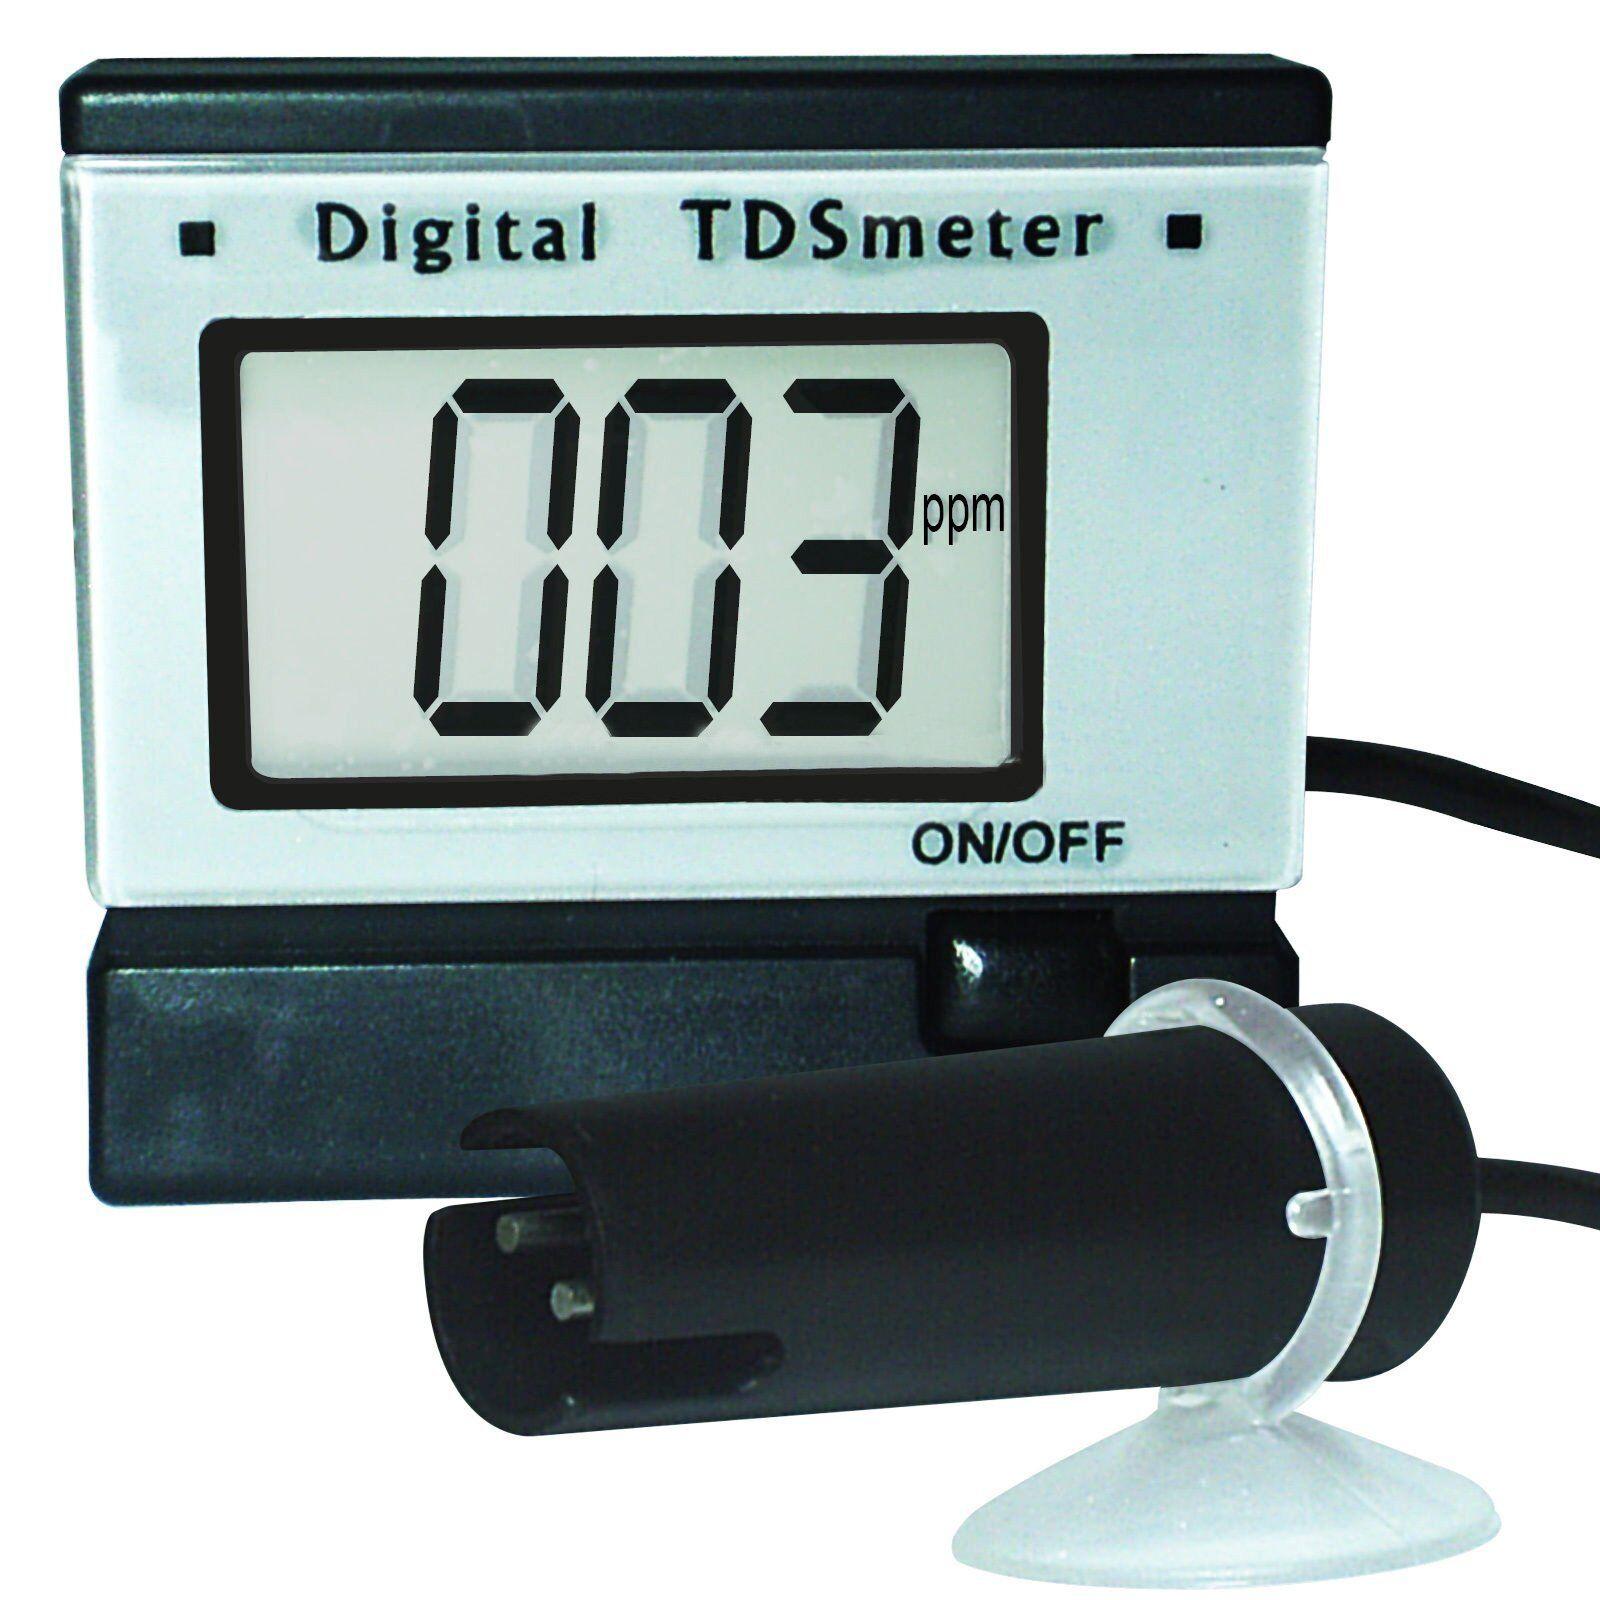 Medidor Digital TDS Tester Agua Acuario 0  1999 PPM (mg l) hydropnics Acuicultura